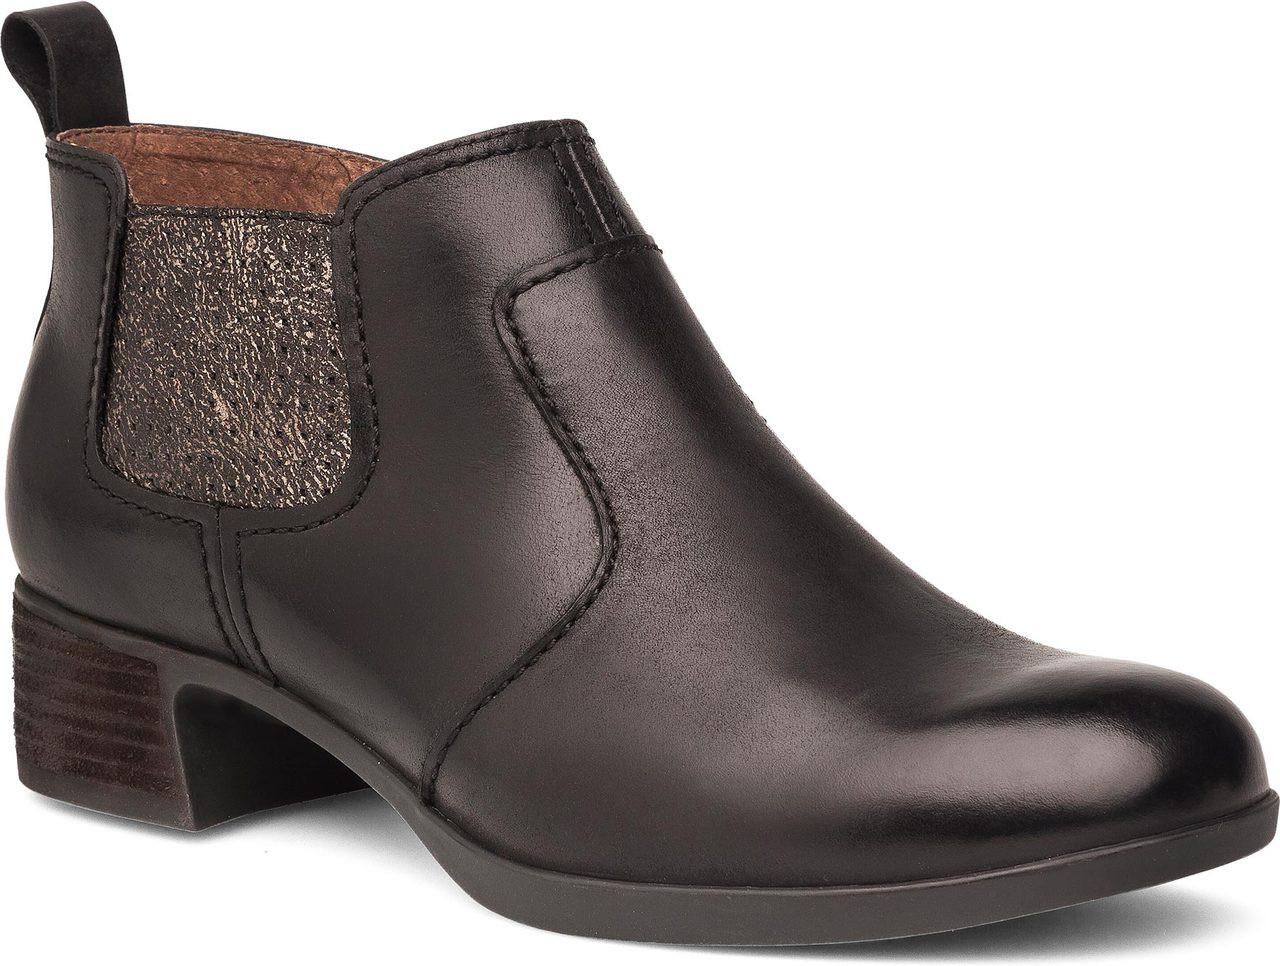 5d641201322 Dansko Lola - FREE Shipping   FREE Returns - Ankle Boots